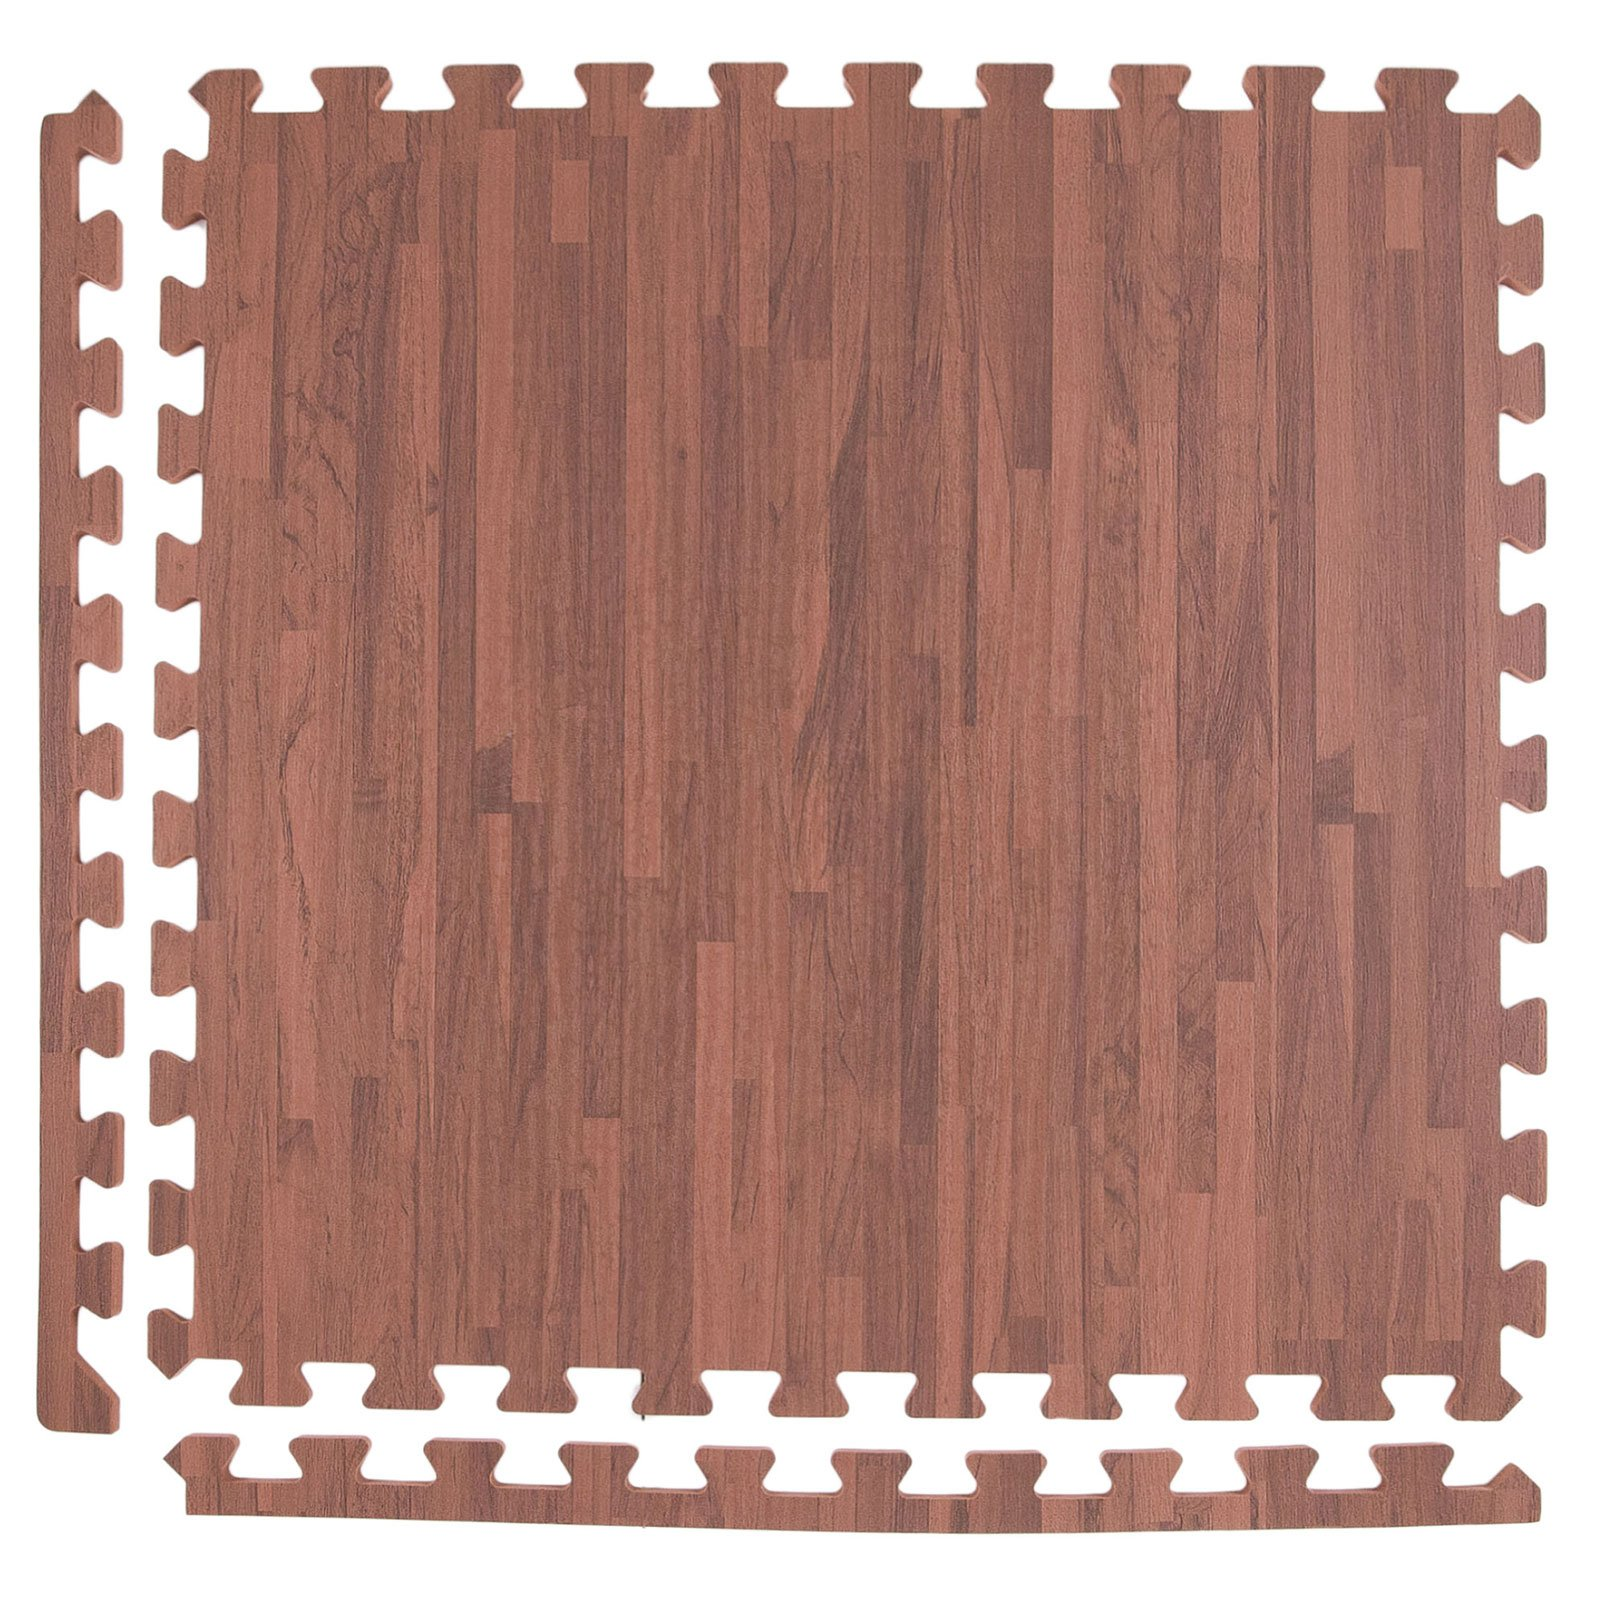 IncStores Soft Wood Foam Tiles (6 Tiles, Textured Mocha) 2ft x 2ft Interlocking Floor Tiles with Edges